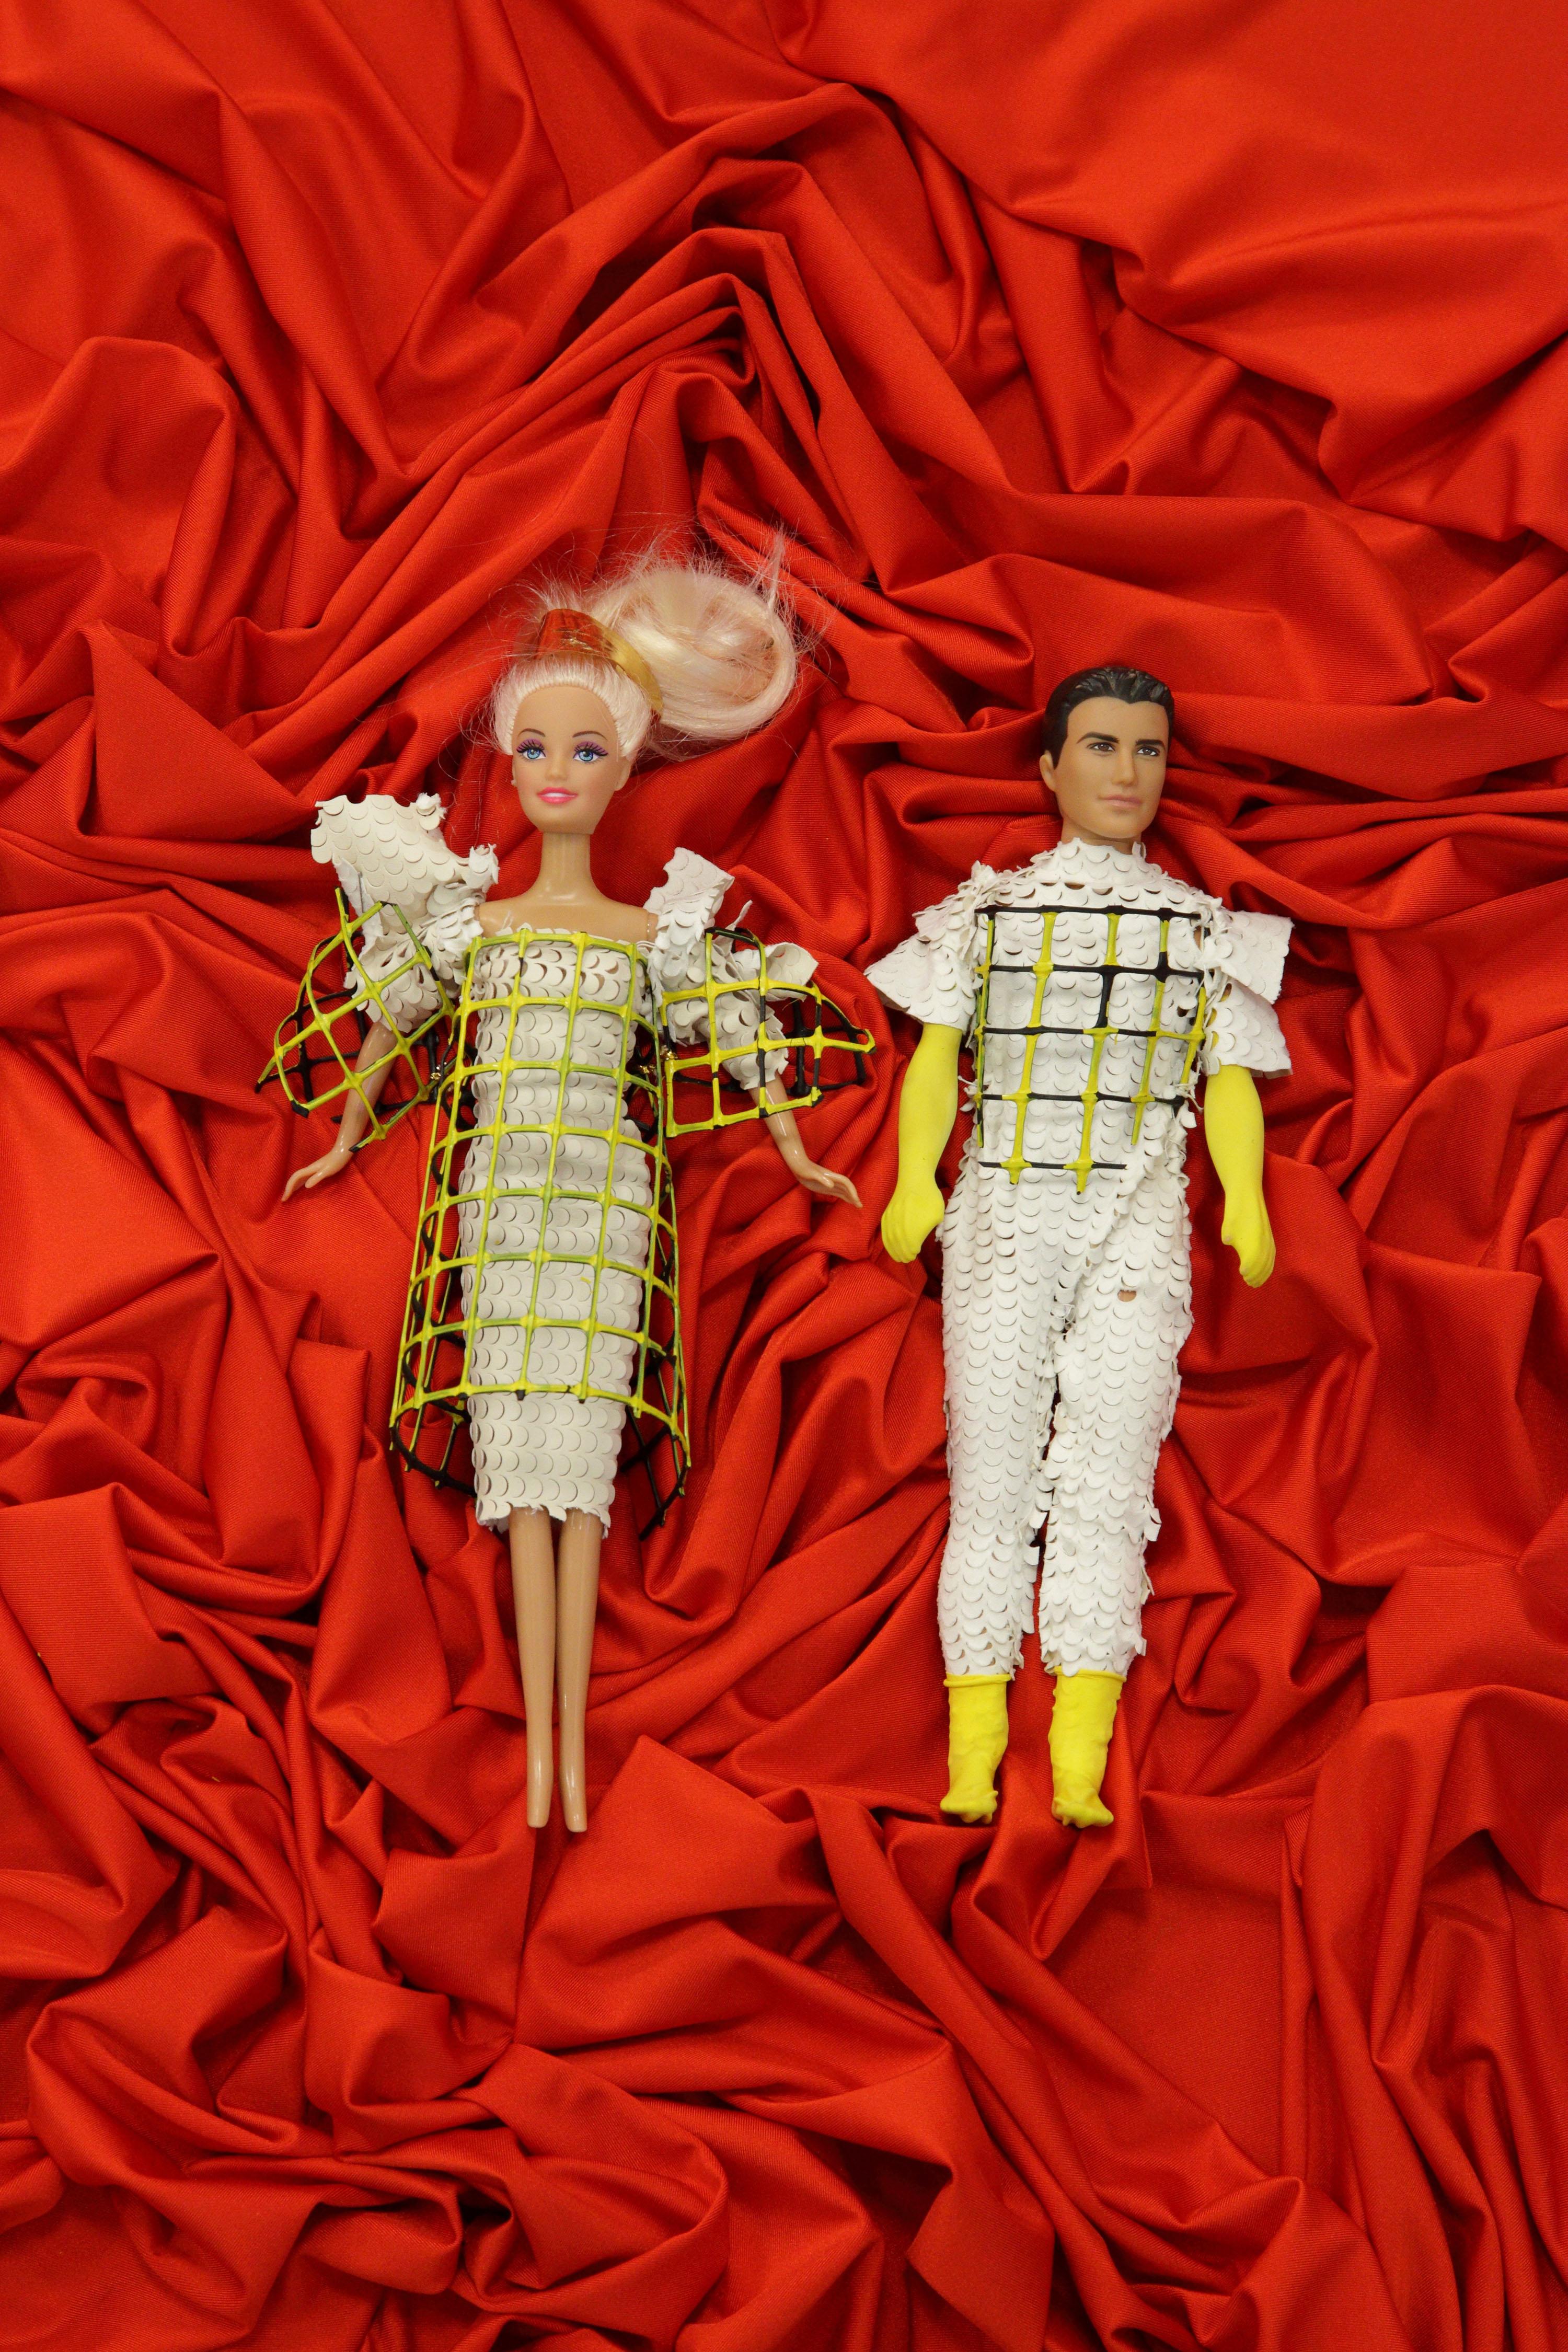 H πριγκίπισσα και το μπιζέλι - μακέτες κοστουμιών Ιωάννας Τσάμη_φωτό Γ. Δομένικος -2